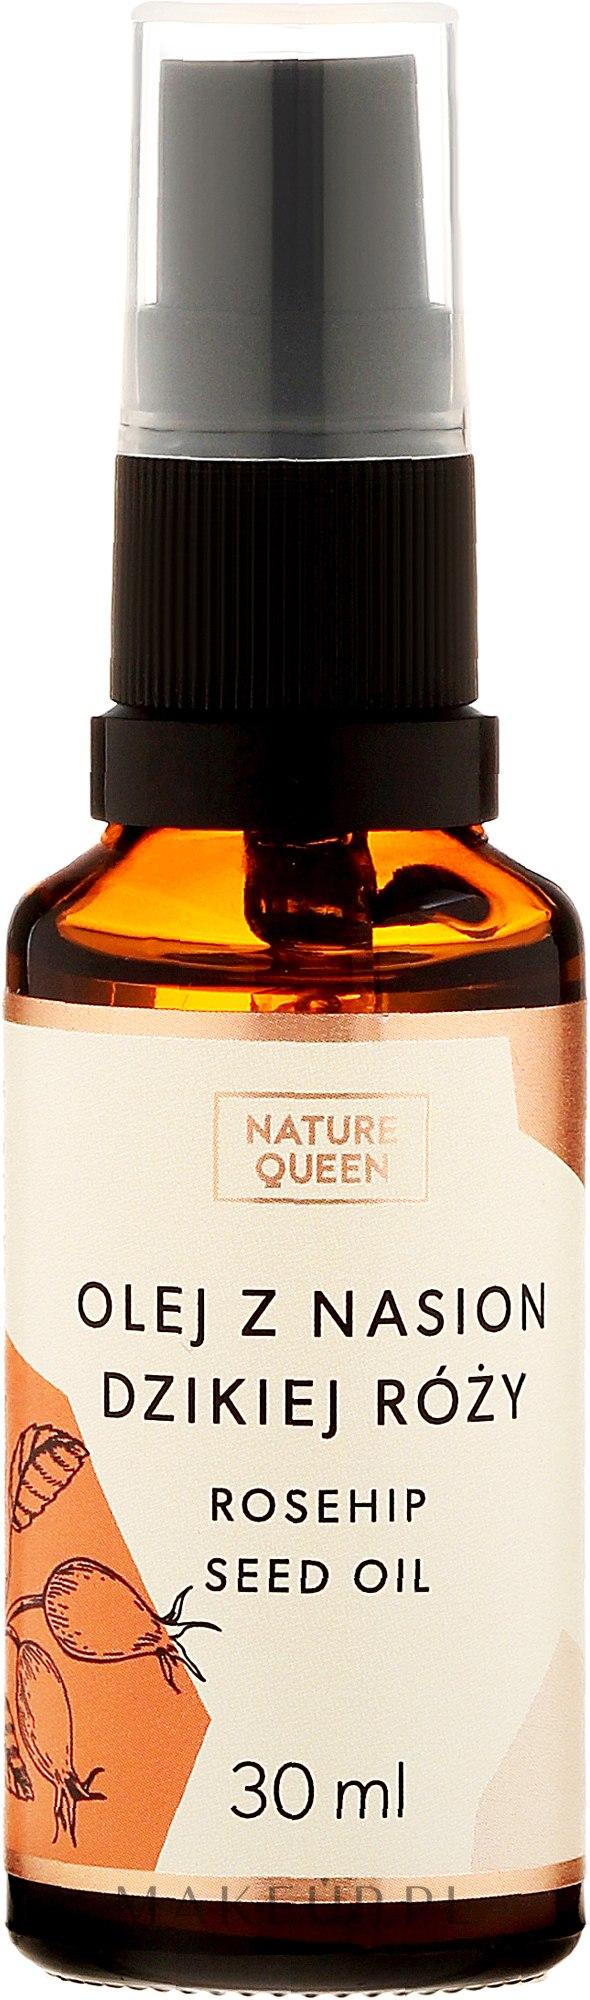 Olej z nasion dzikiej róży - Nature Queen Rosehip Seed Oil — фото 30 ml